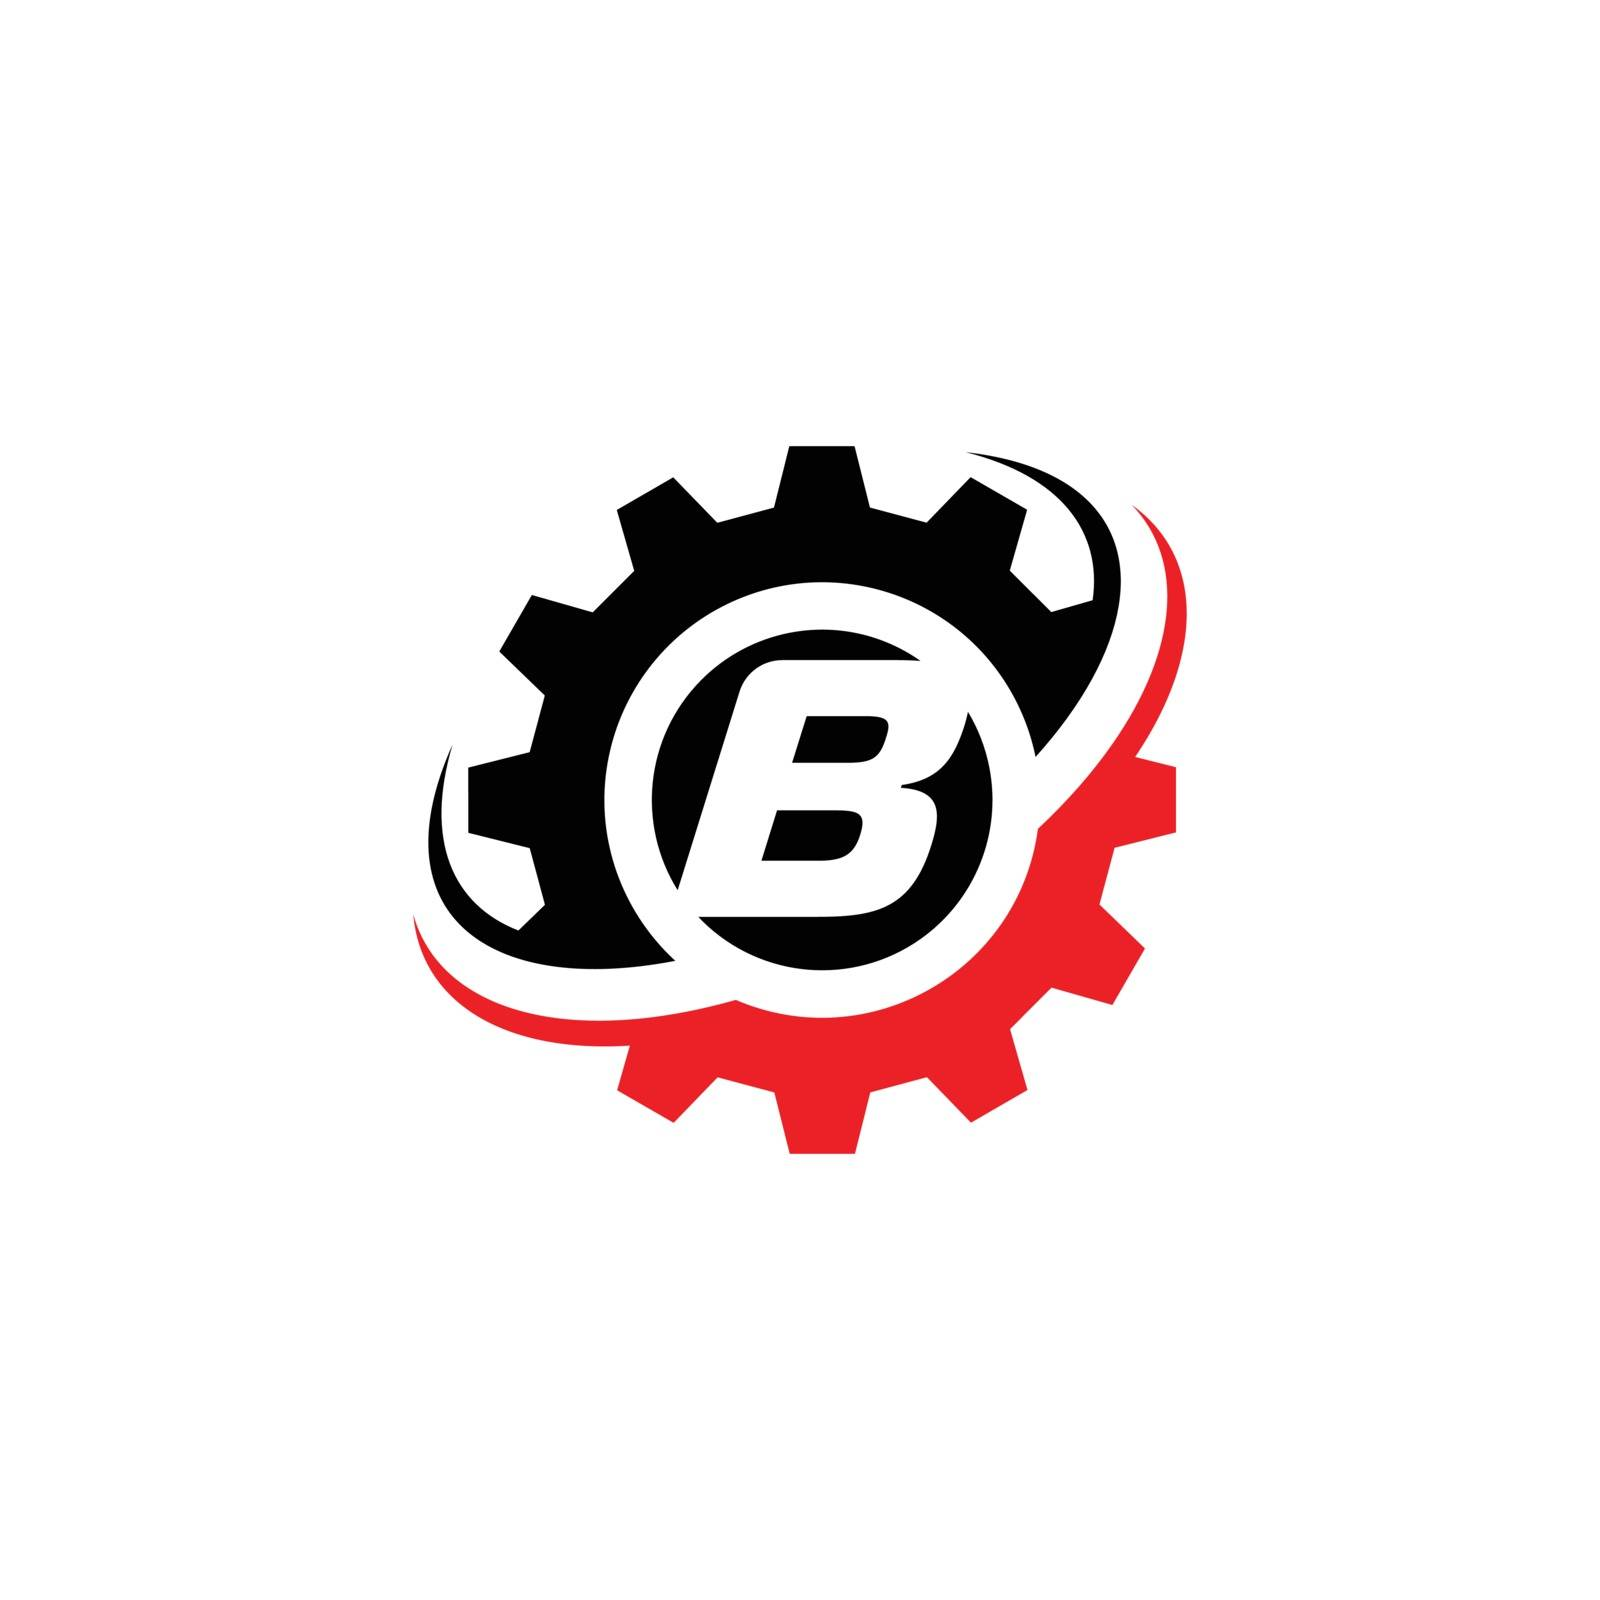 Letter B Gear Logo Design Template